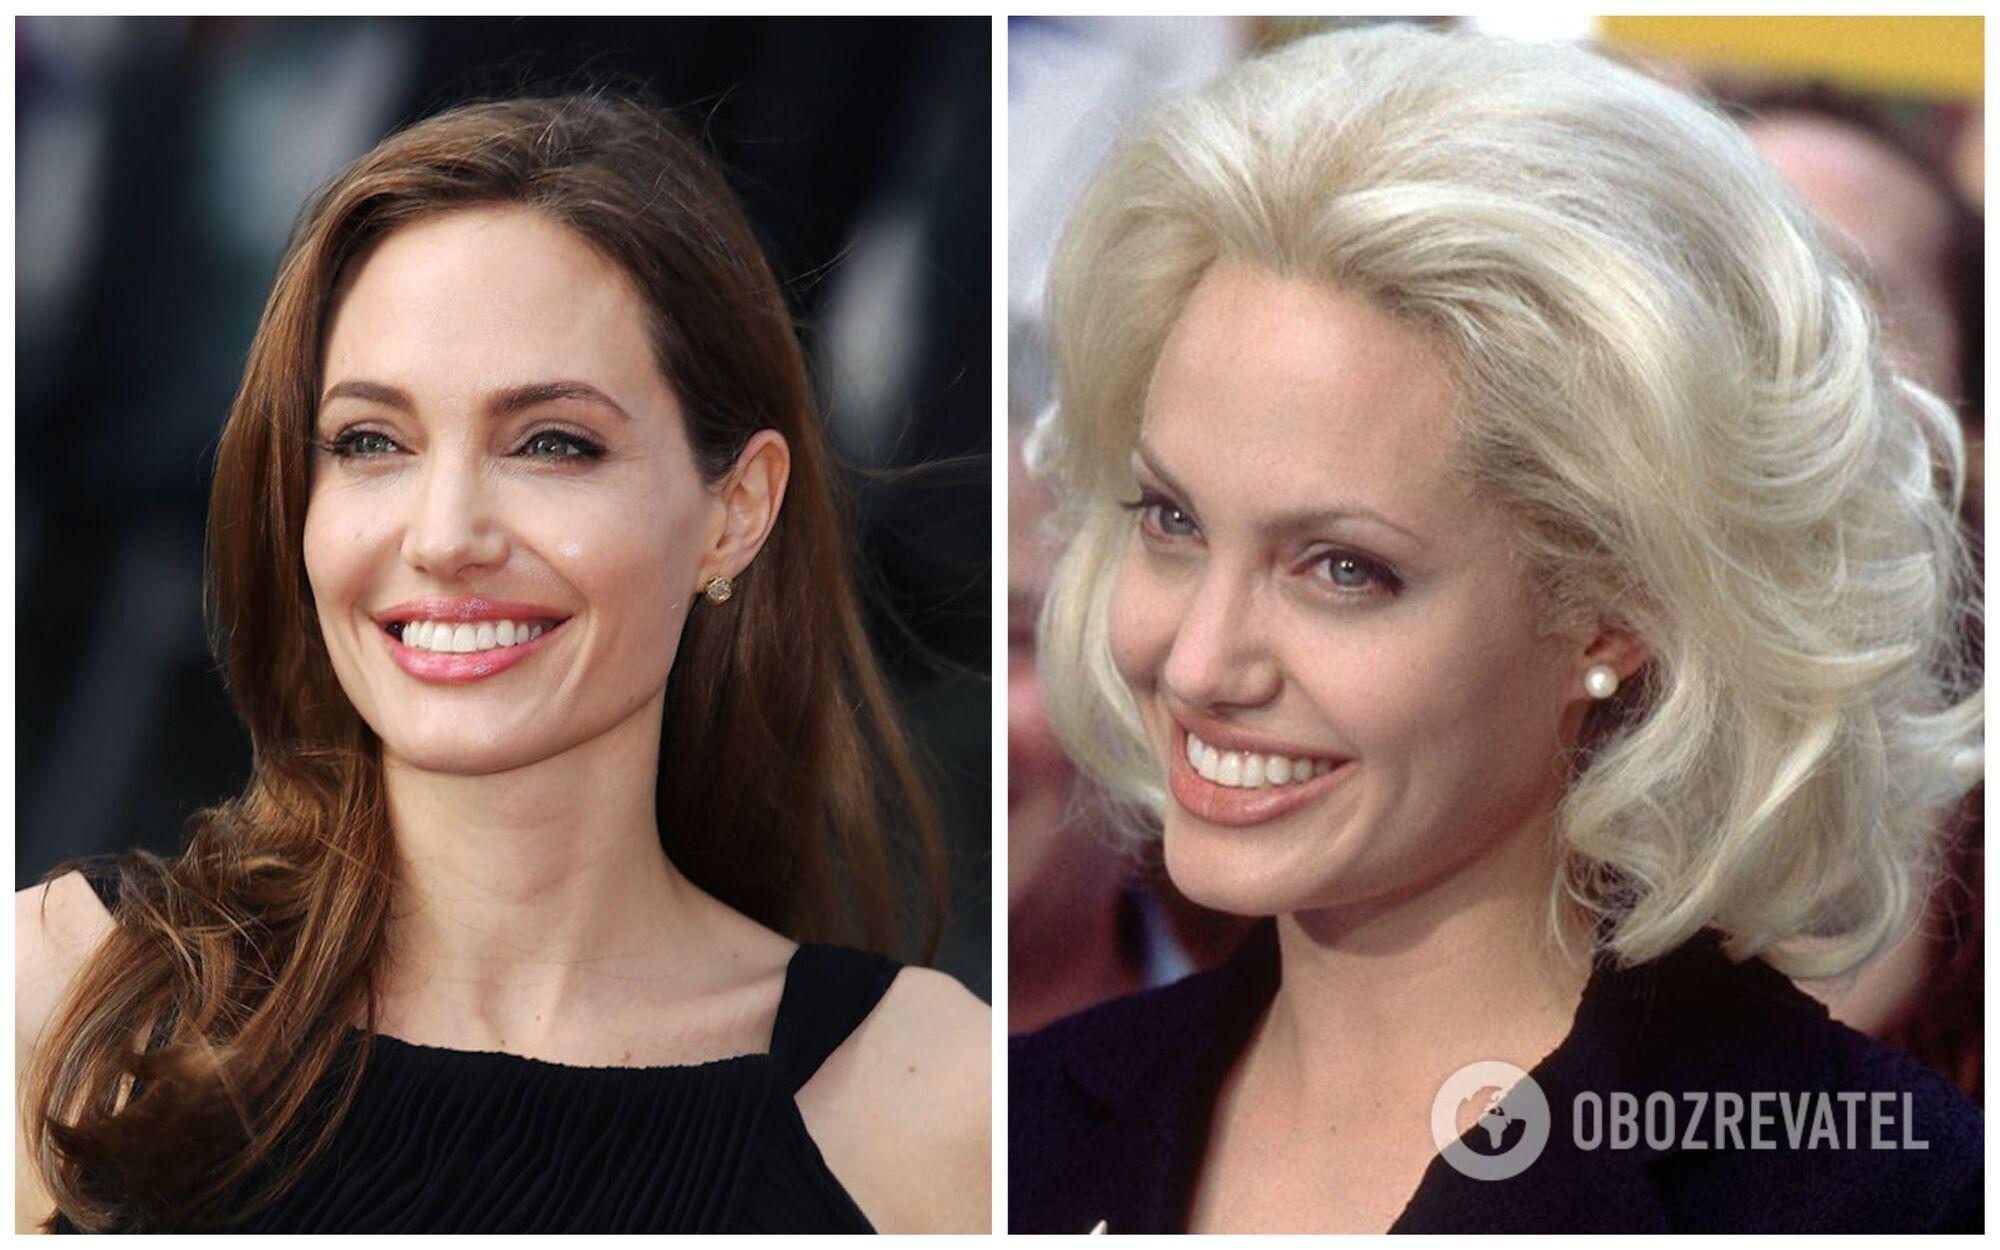 Анджелина Джоли пыталась быть похожей на Мэрилин Монро.